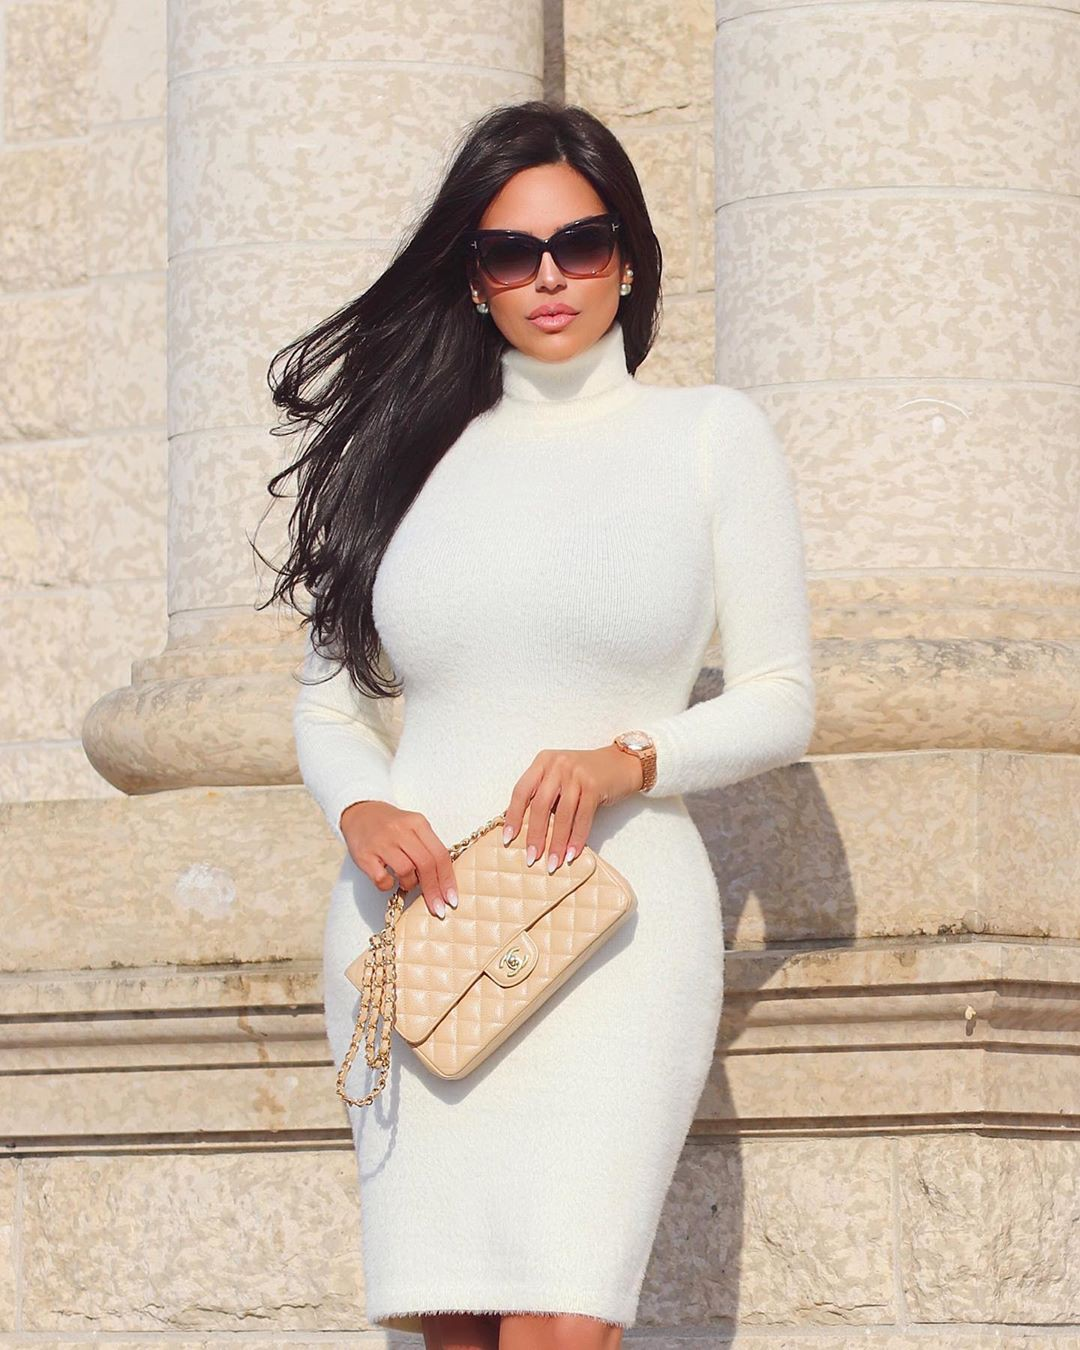 Beige and white dress pencil skirt, sunglasses, eyewear